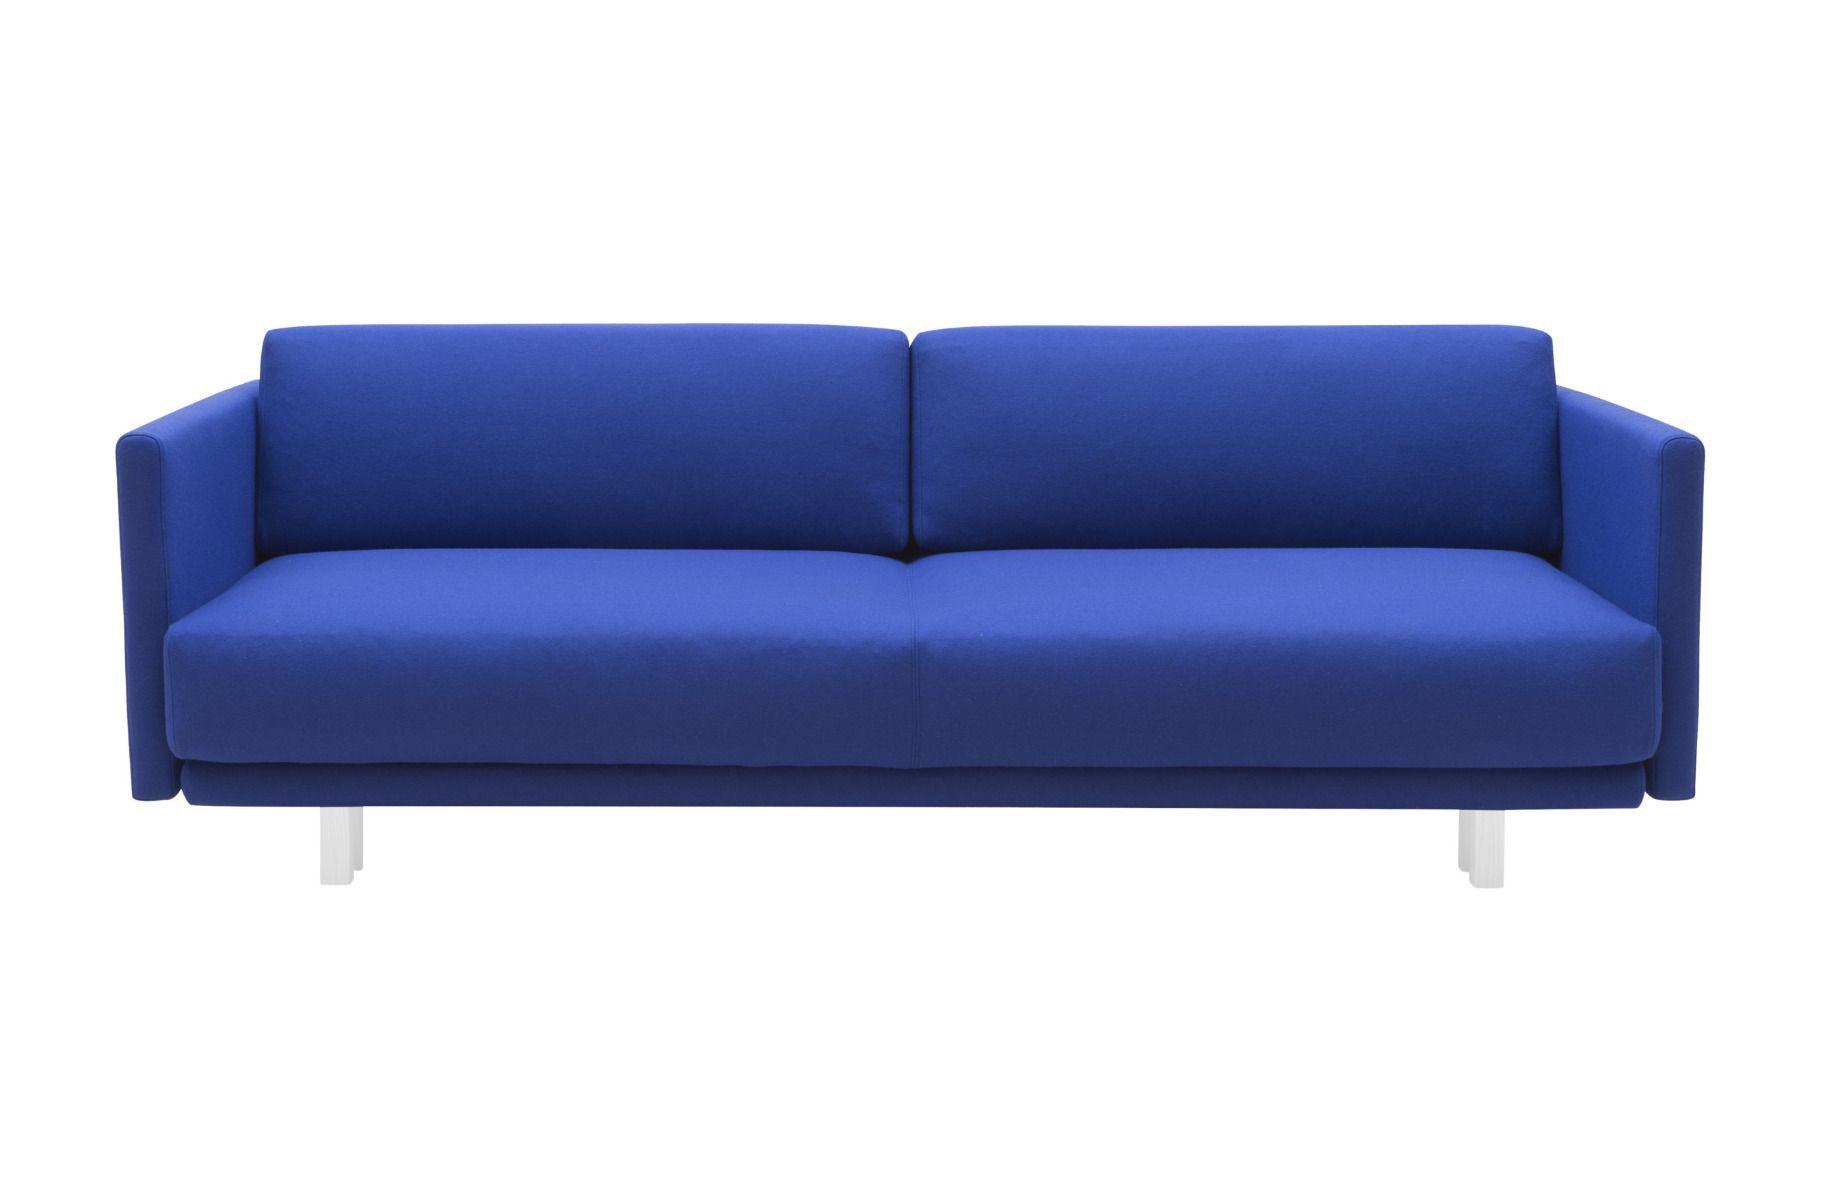 Full Size of Sofa Mondo 2 Agata Meble Kaufen Softline Bed Bertinoro Orari 1 Couch Group Srl Leder Capocolle Brick Schillig Sofort Lieferbar Freistil L Form München Sofa Mondo Sofa